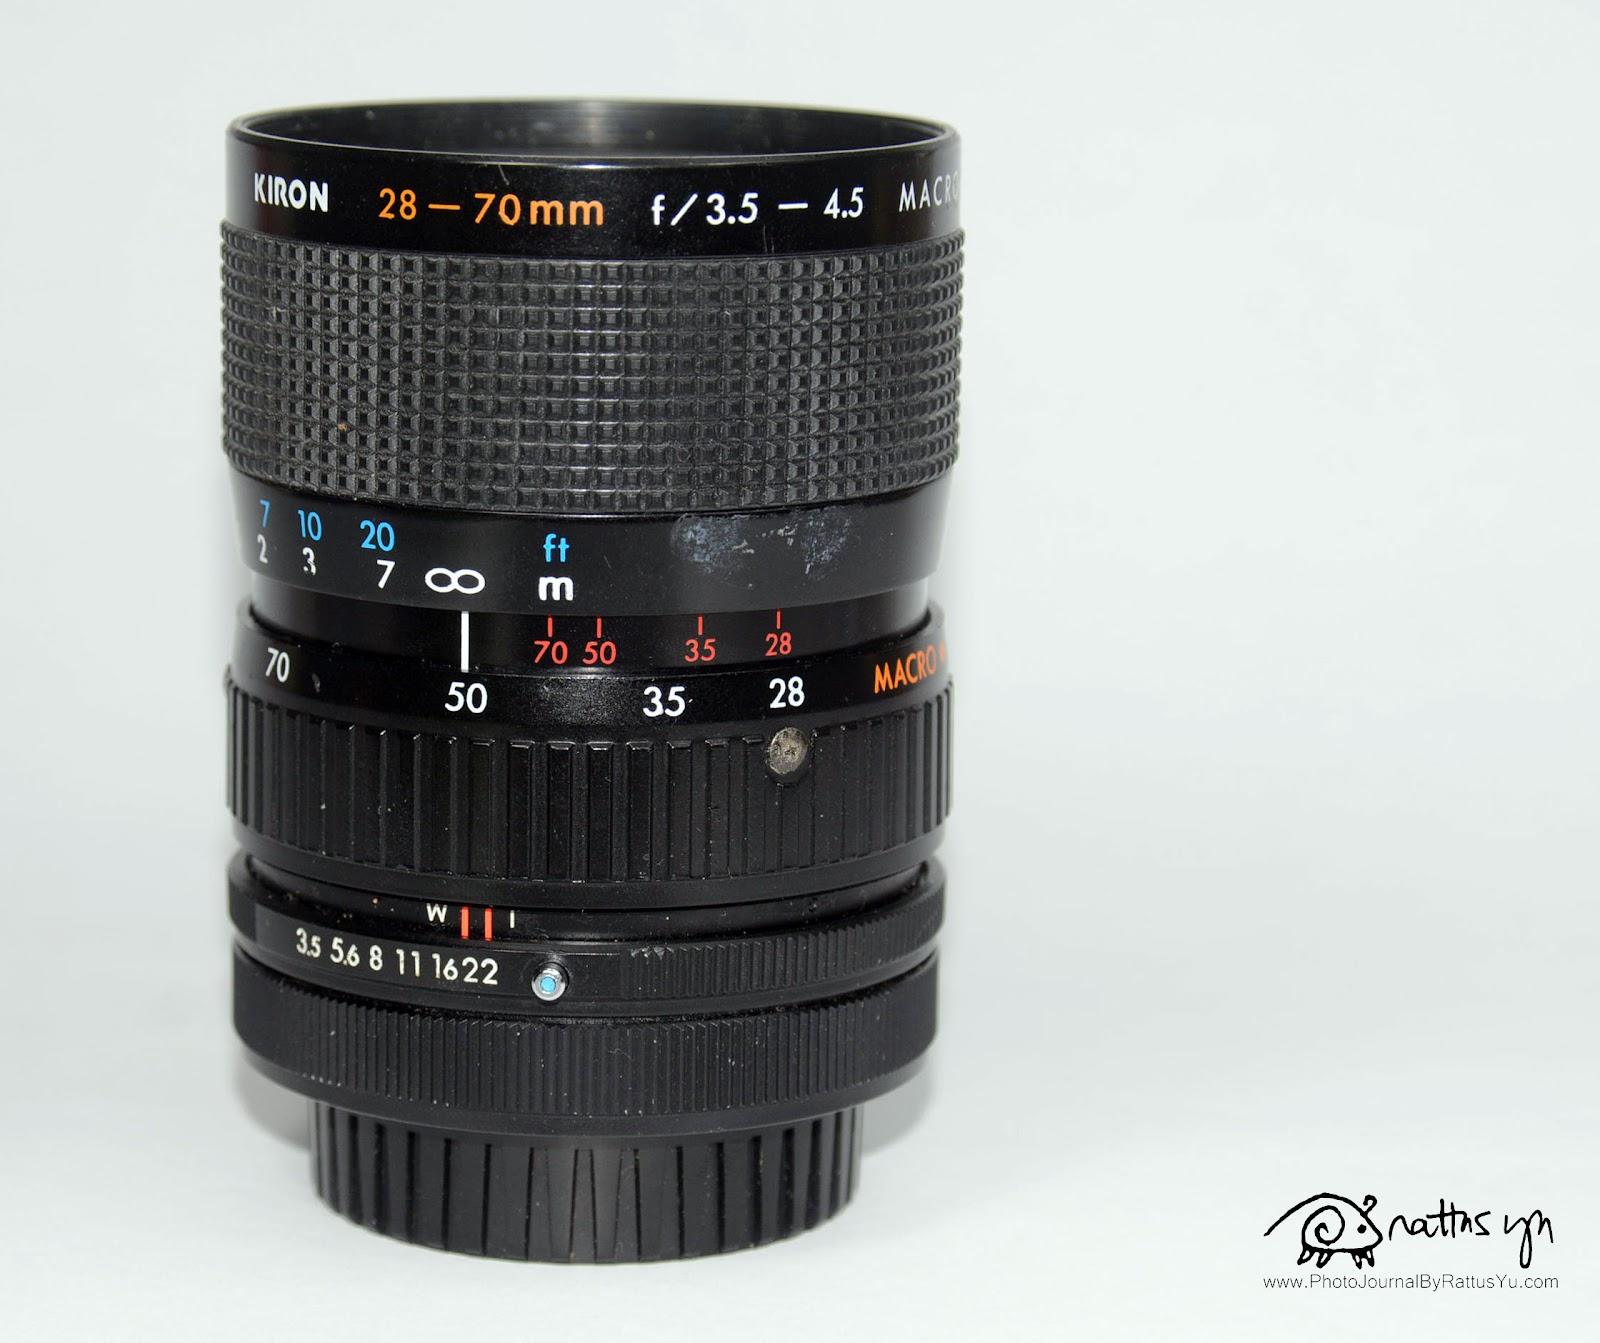 Kiron 28-70mm f/3.5-4.5 Macro